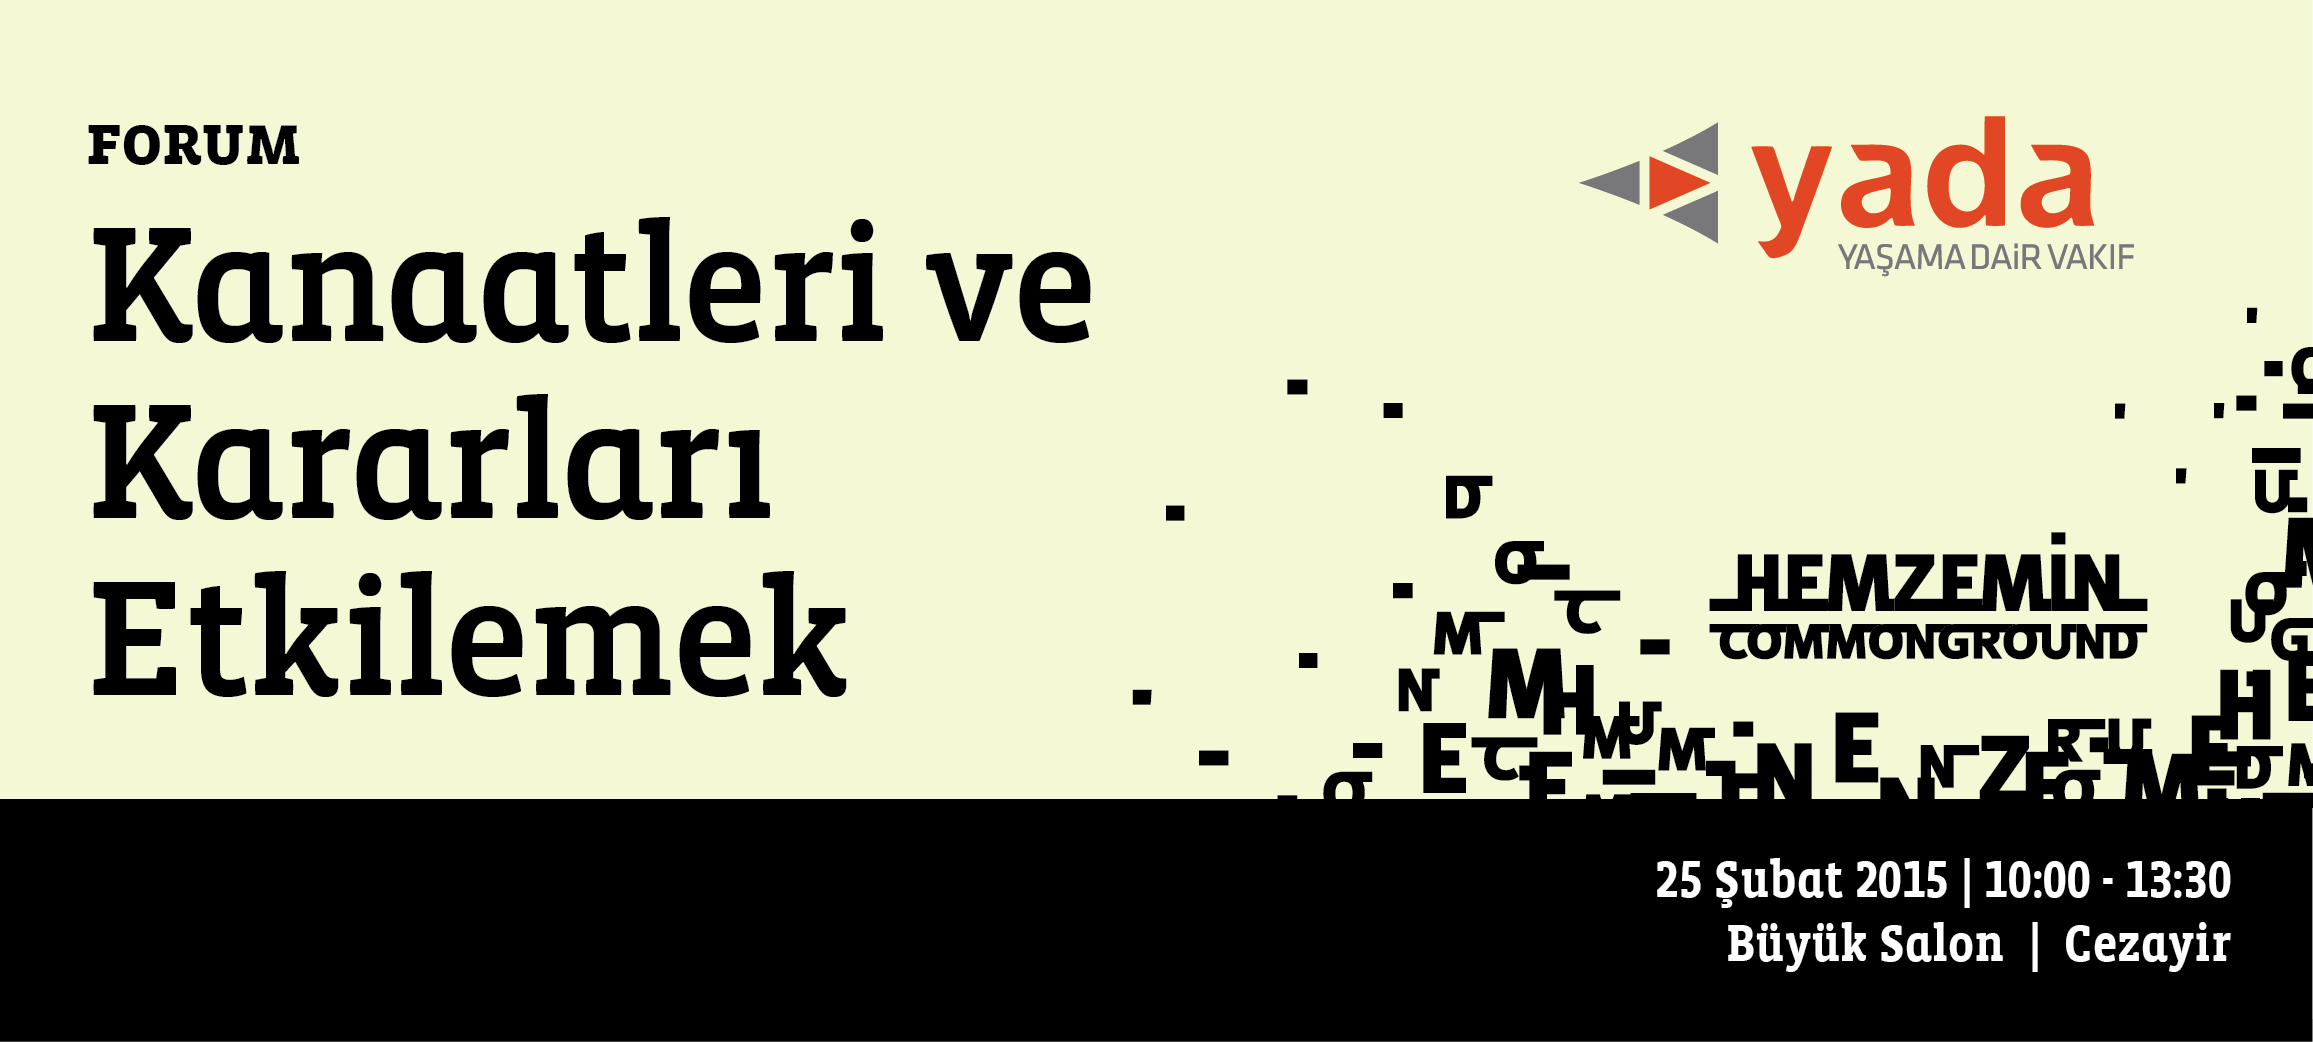 E-davetiyeCezayir-13